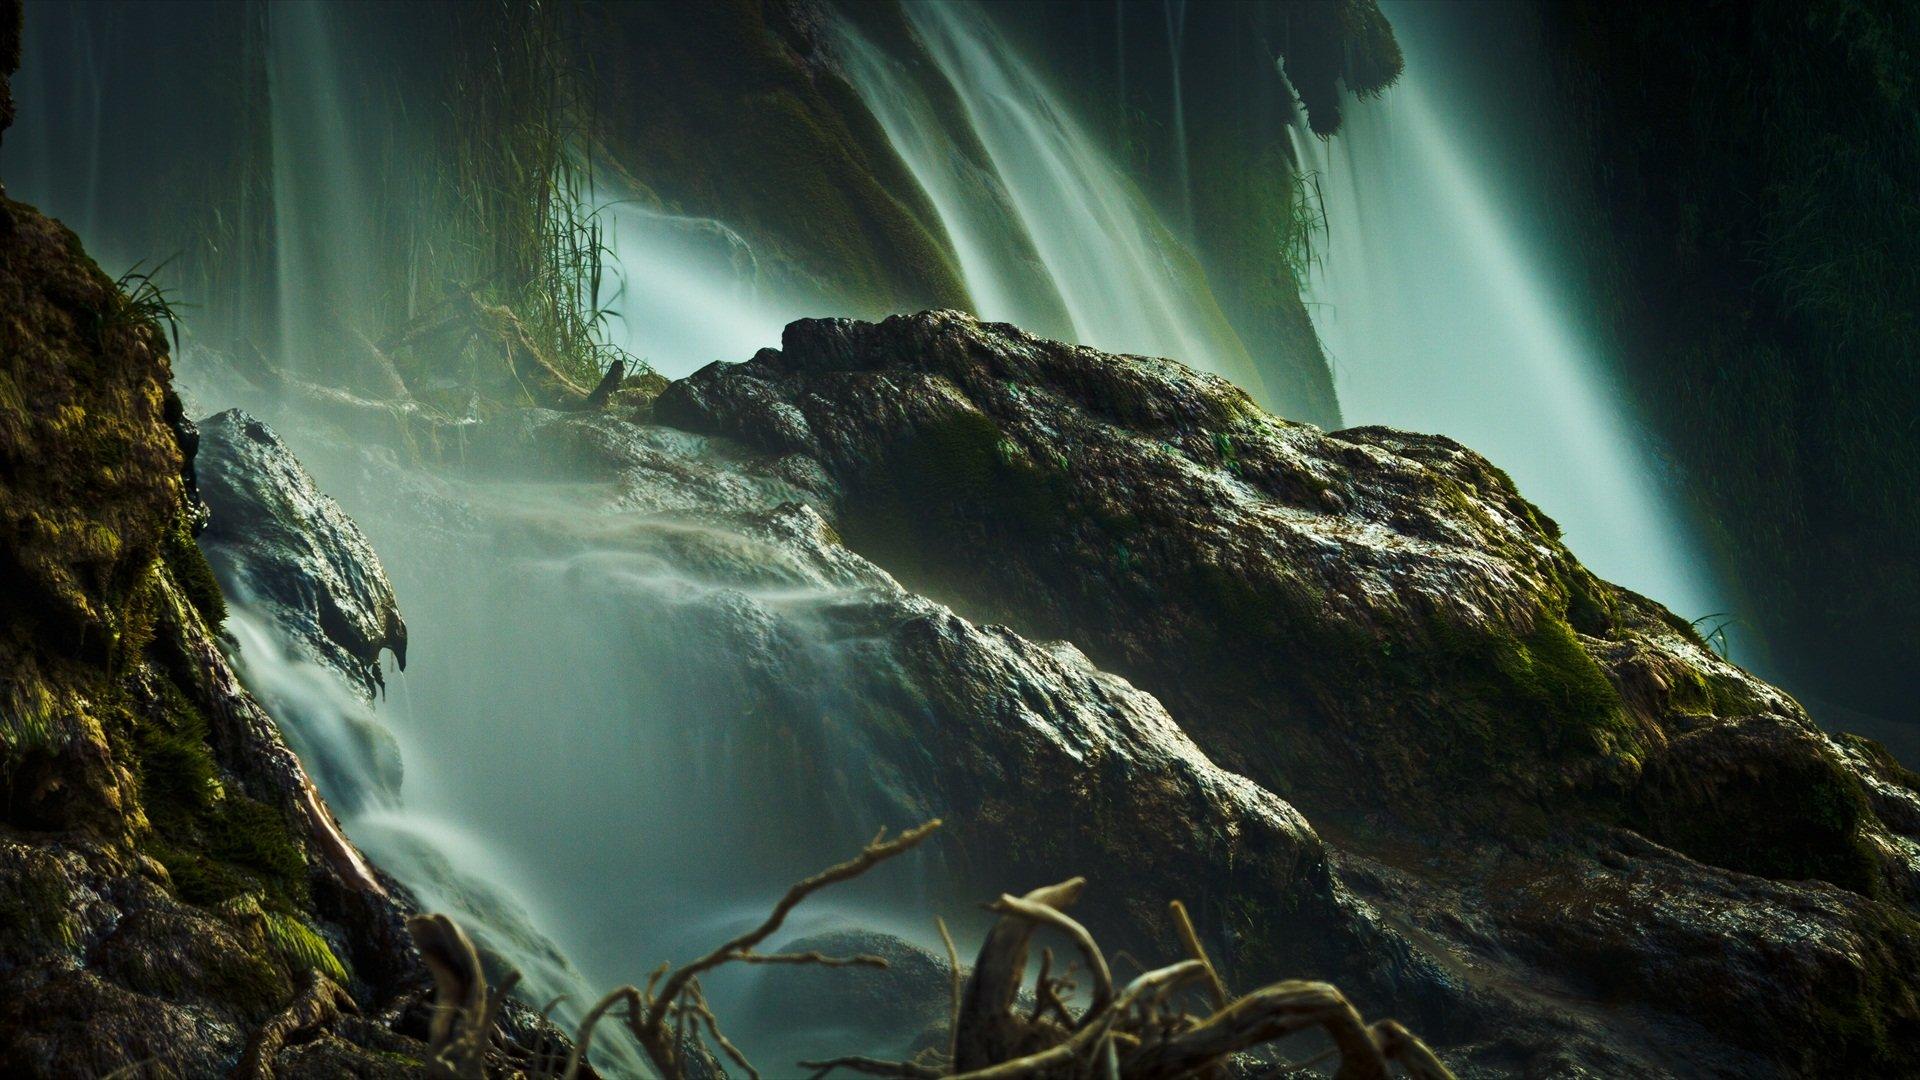 Waterfall Wallpapers 1920x1080 Full Hd 1080p Desktop Backgrounds